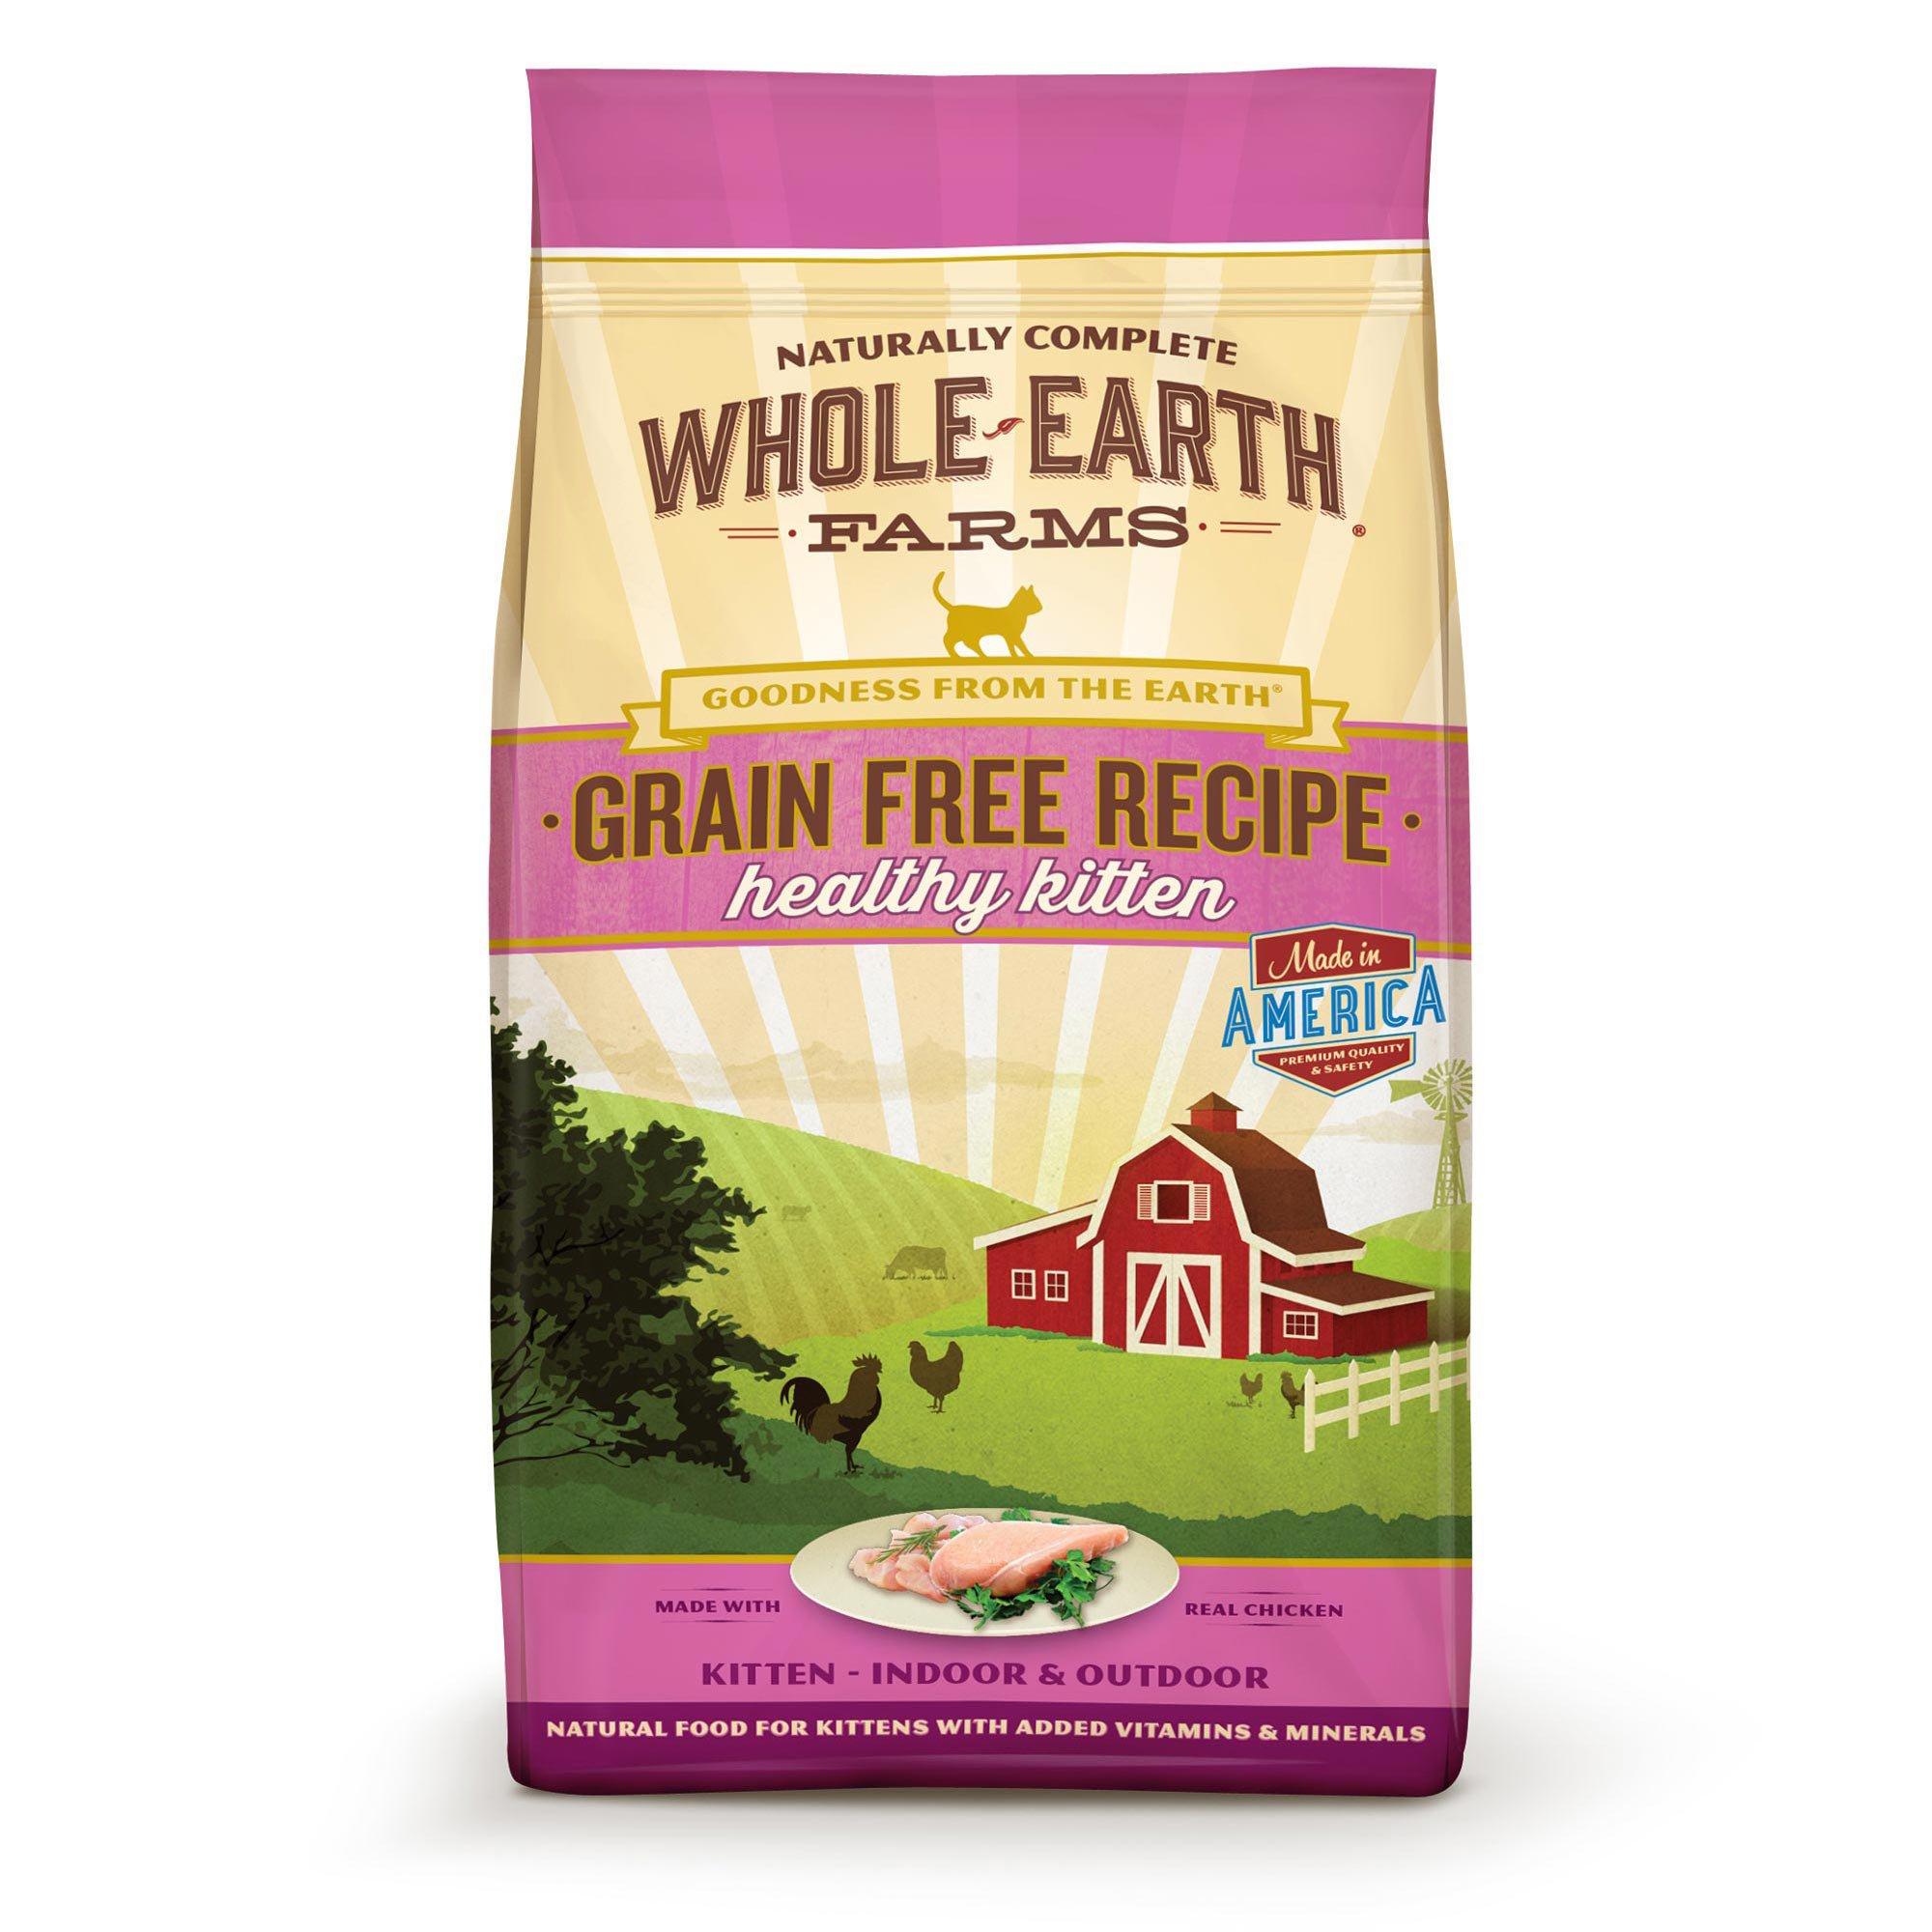 Whole Earth Farms Grain Free Real Chicken Kitten Food 2 5 Lbs Dry Cat Food Kitten Food Grain Free Recipes